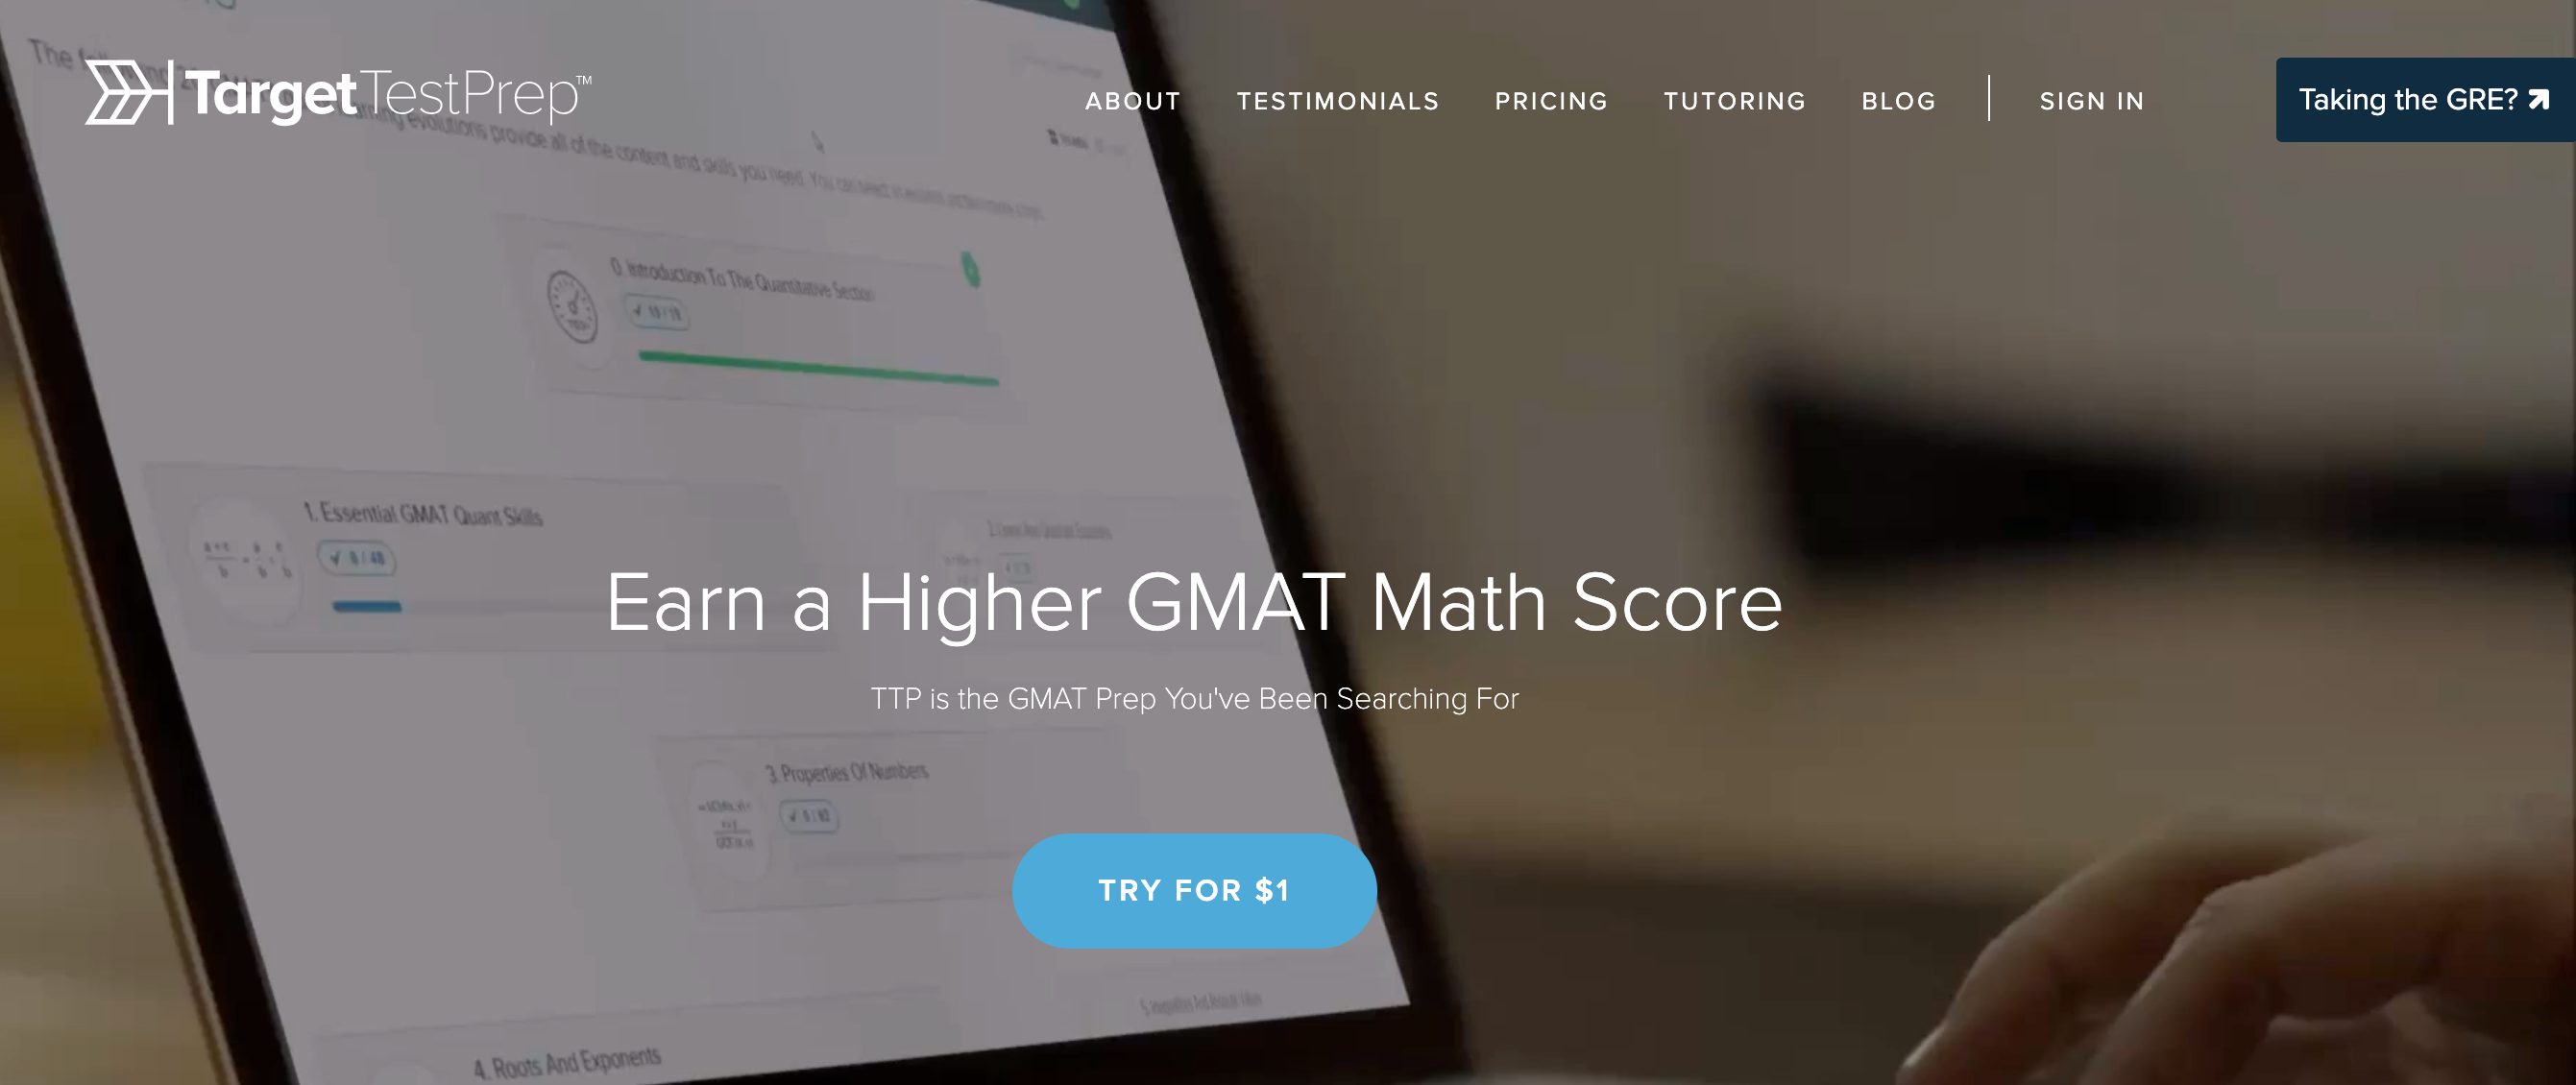 GMAT Prep- TargetTestPrep